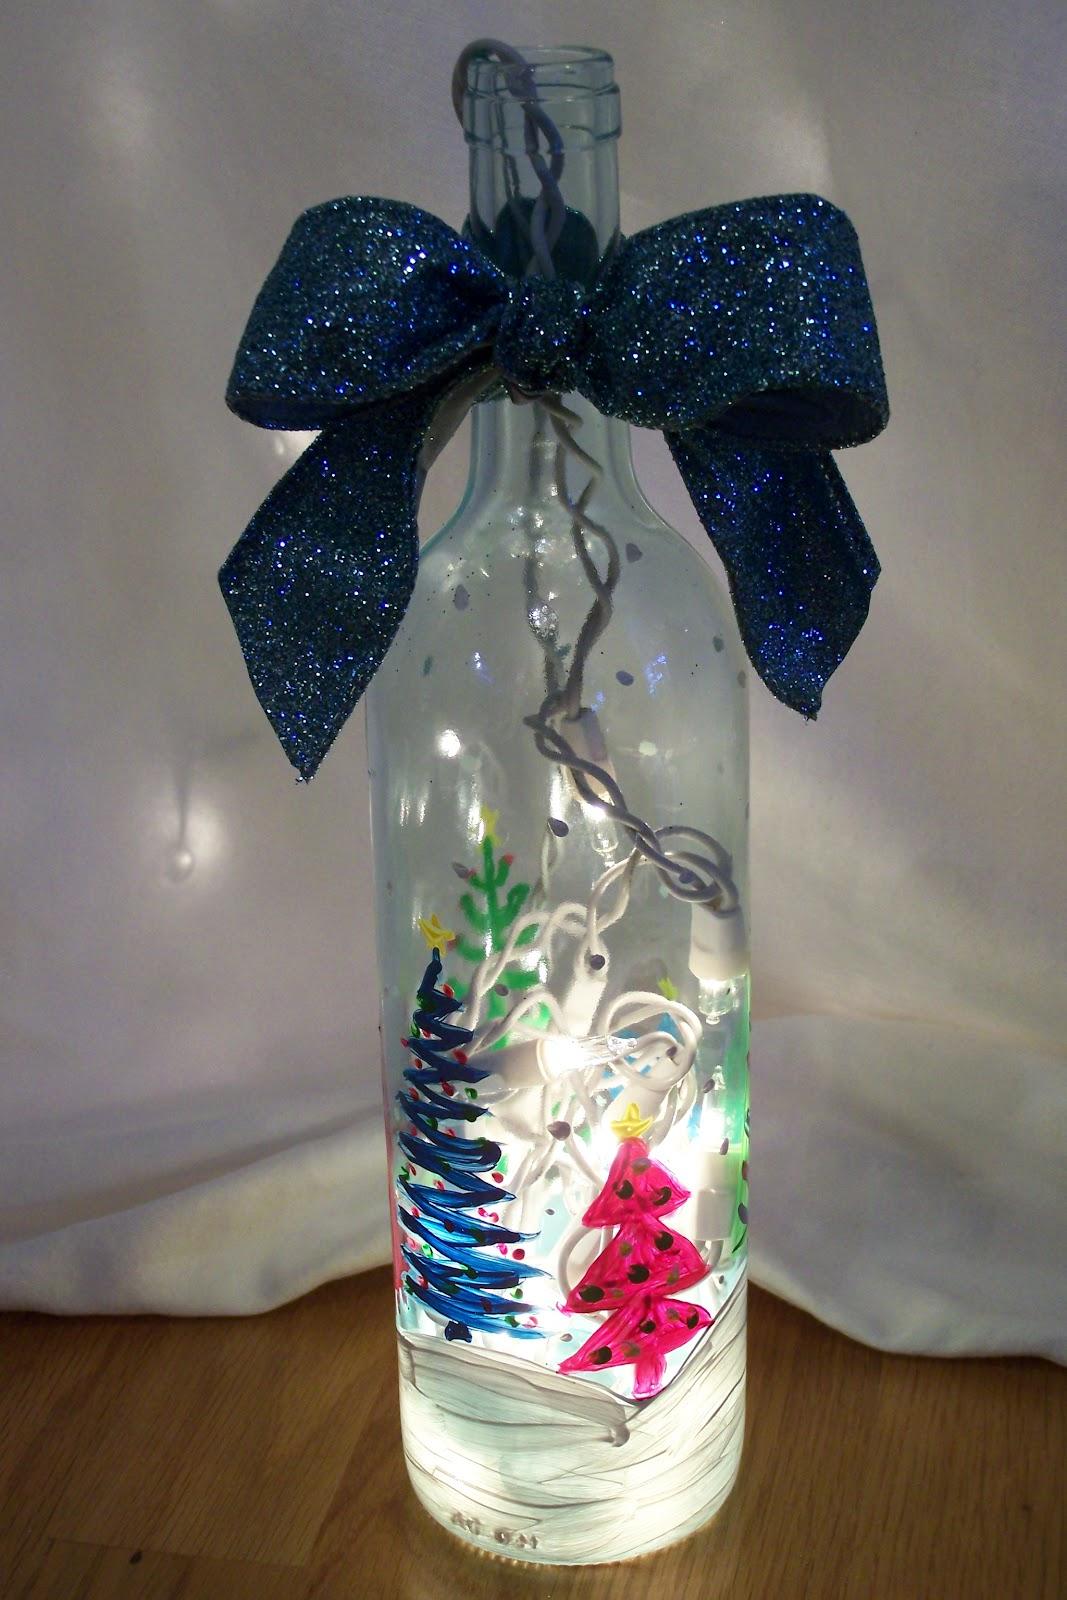 новогодняя бутылка-светильник со шнуром через горло